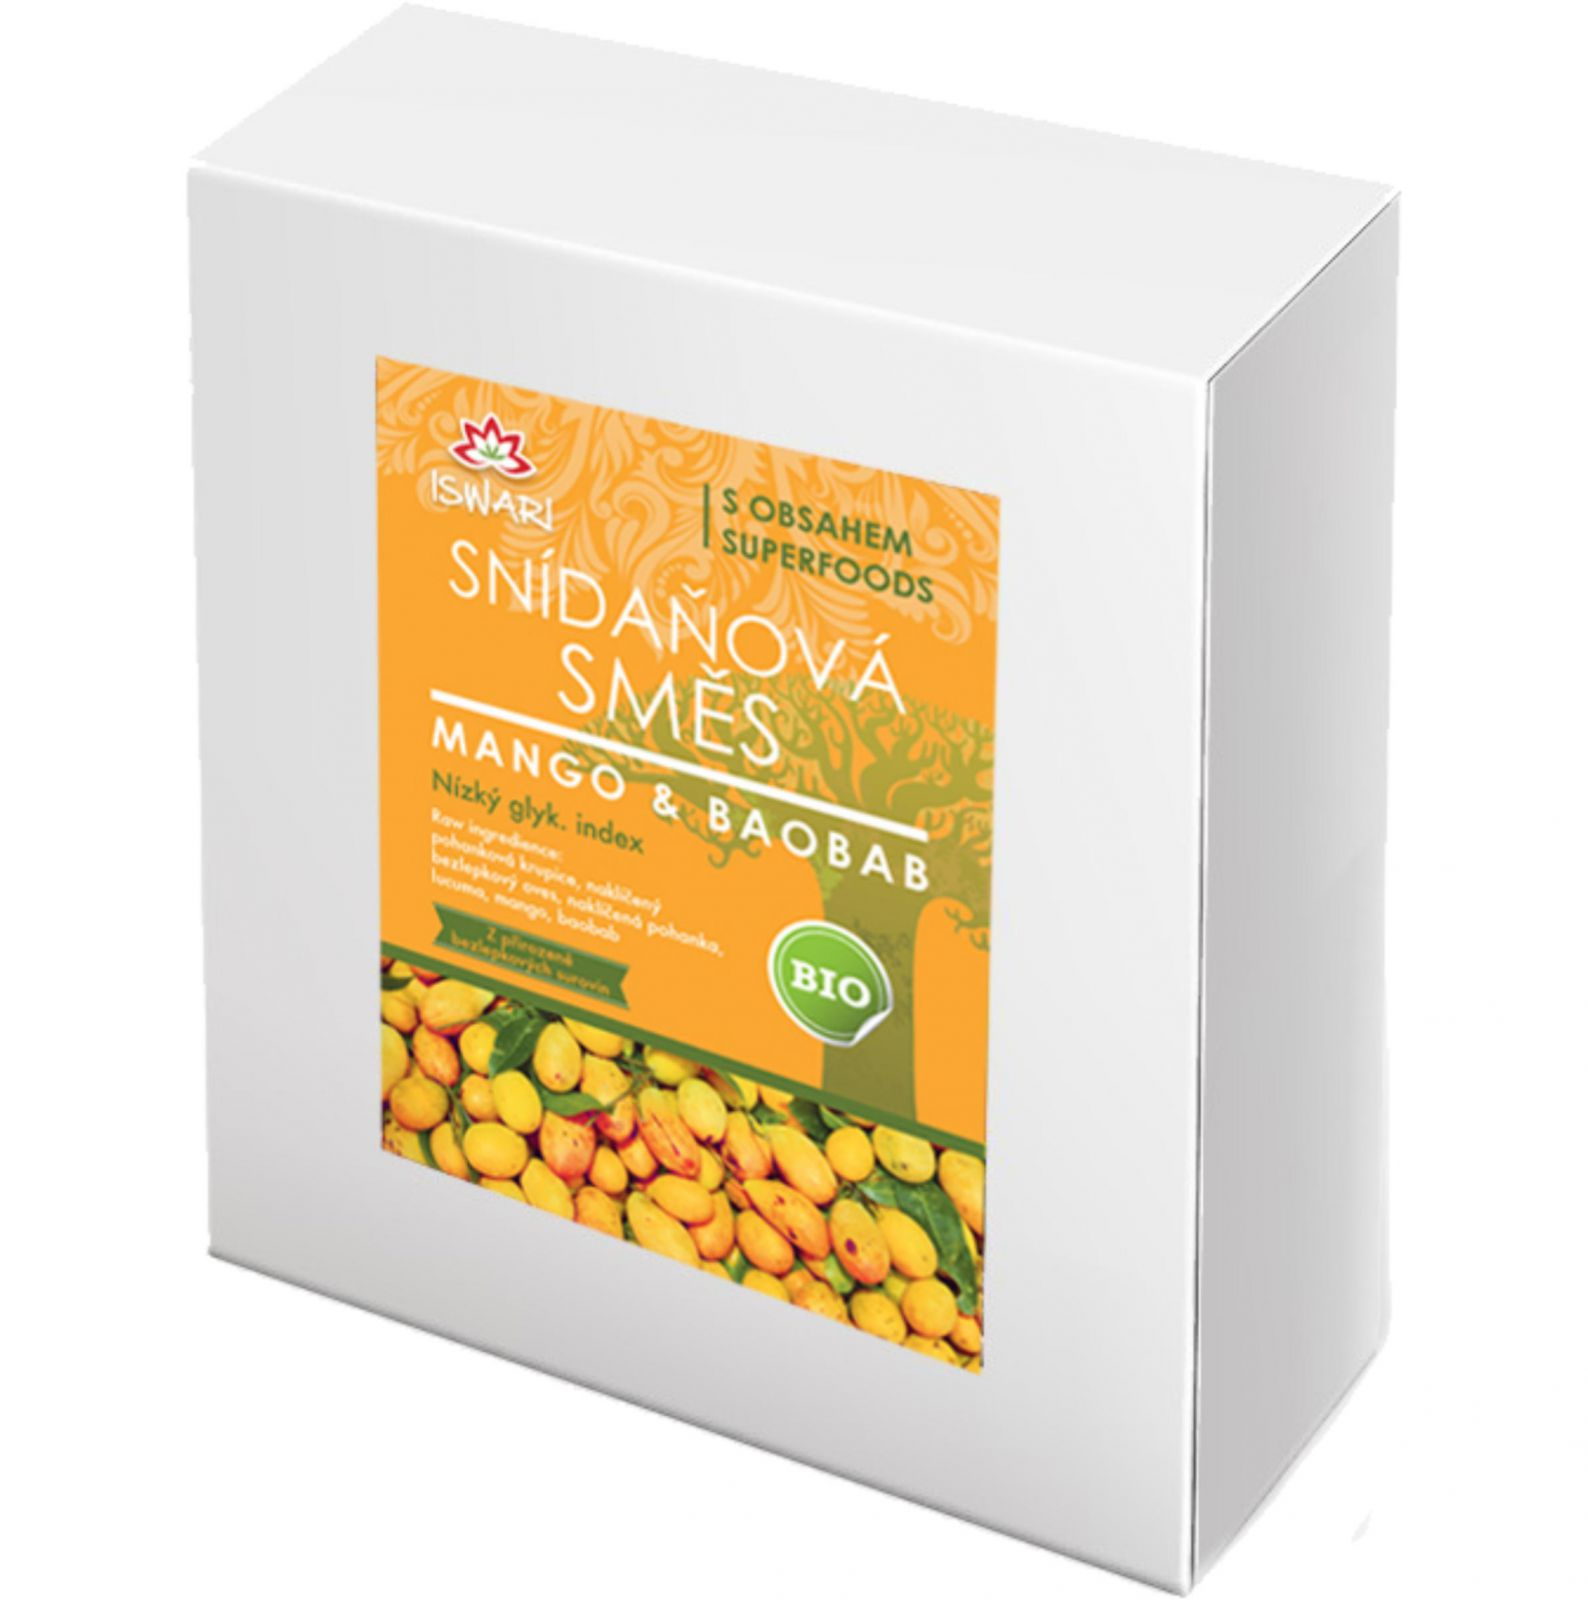 Iswari BIO Snídaňová směs 3600 g - mango & baobab